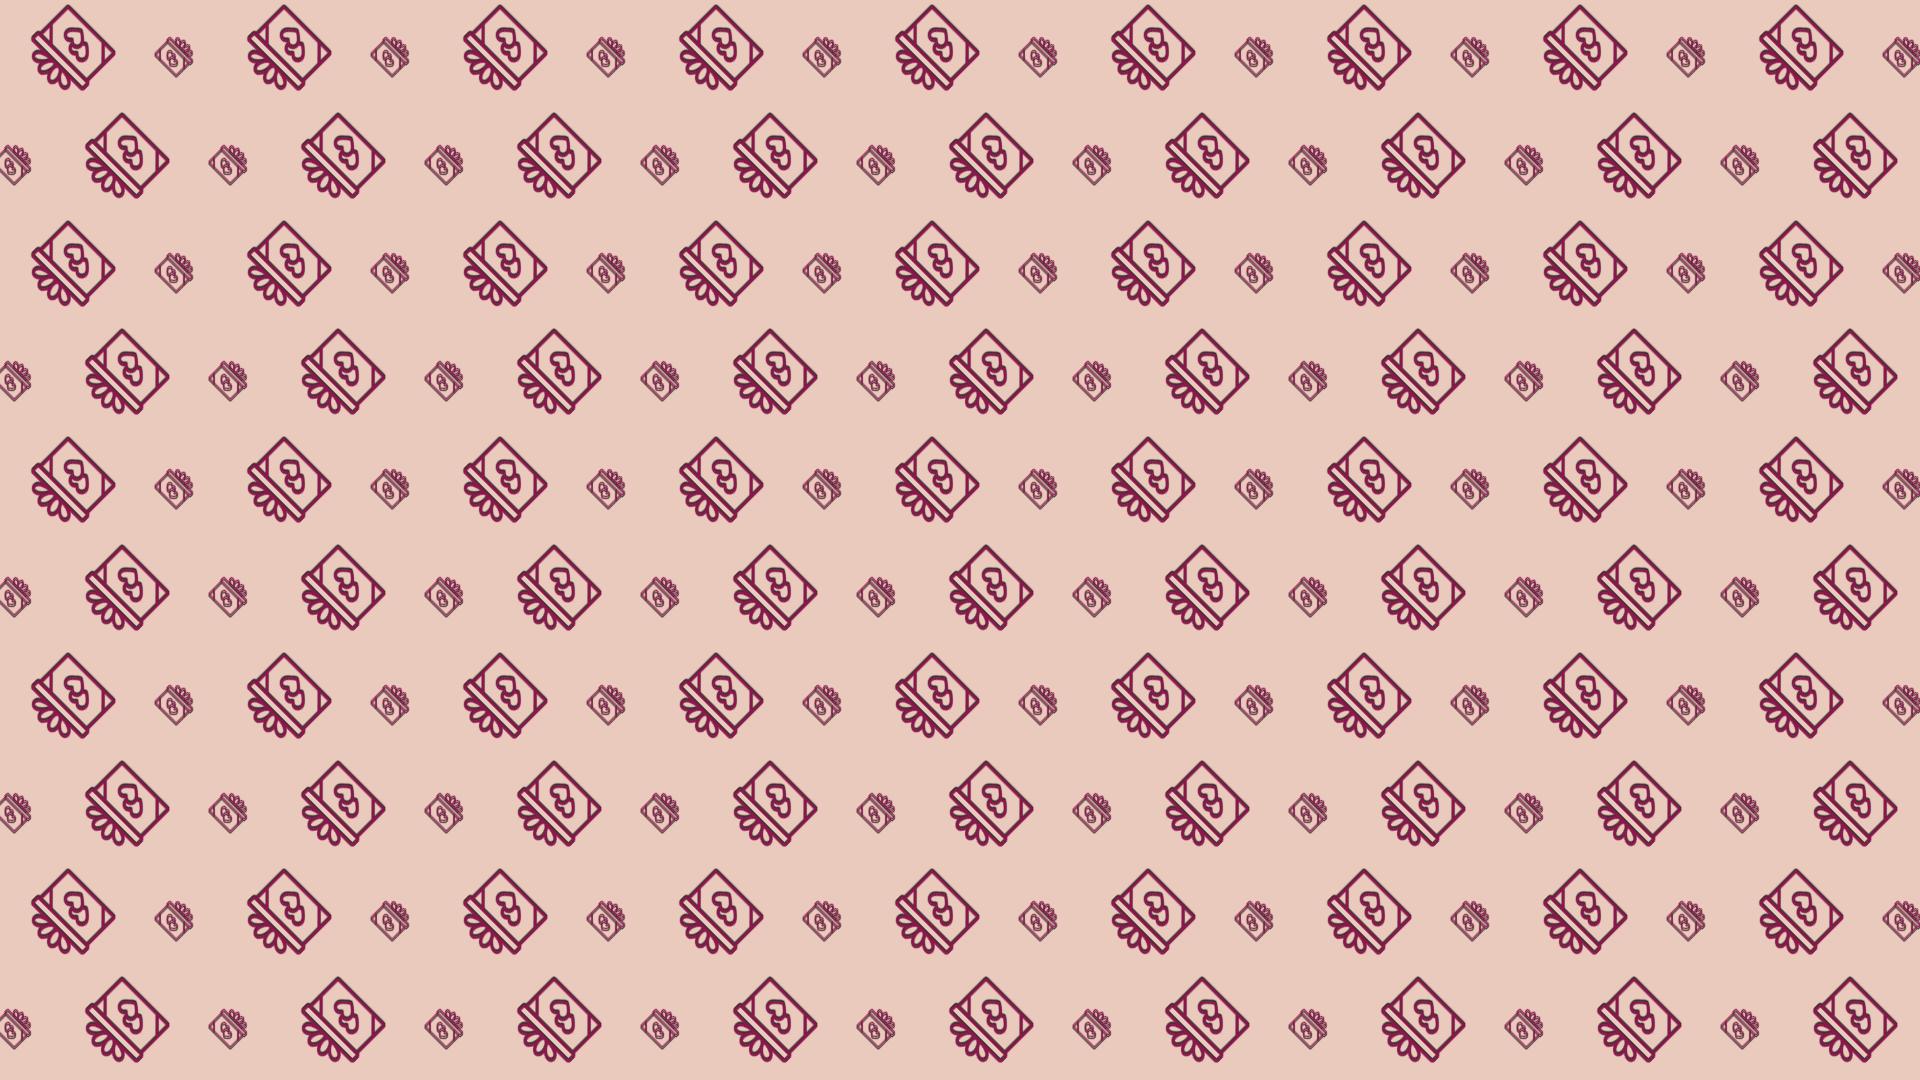 Pink, Purple, Text, Pattern, Font, Design, Magenta, Heart, Music, Shapes, Circles, Present, Drum,  Free Image